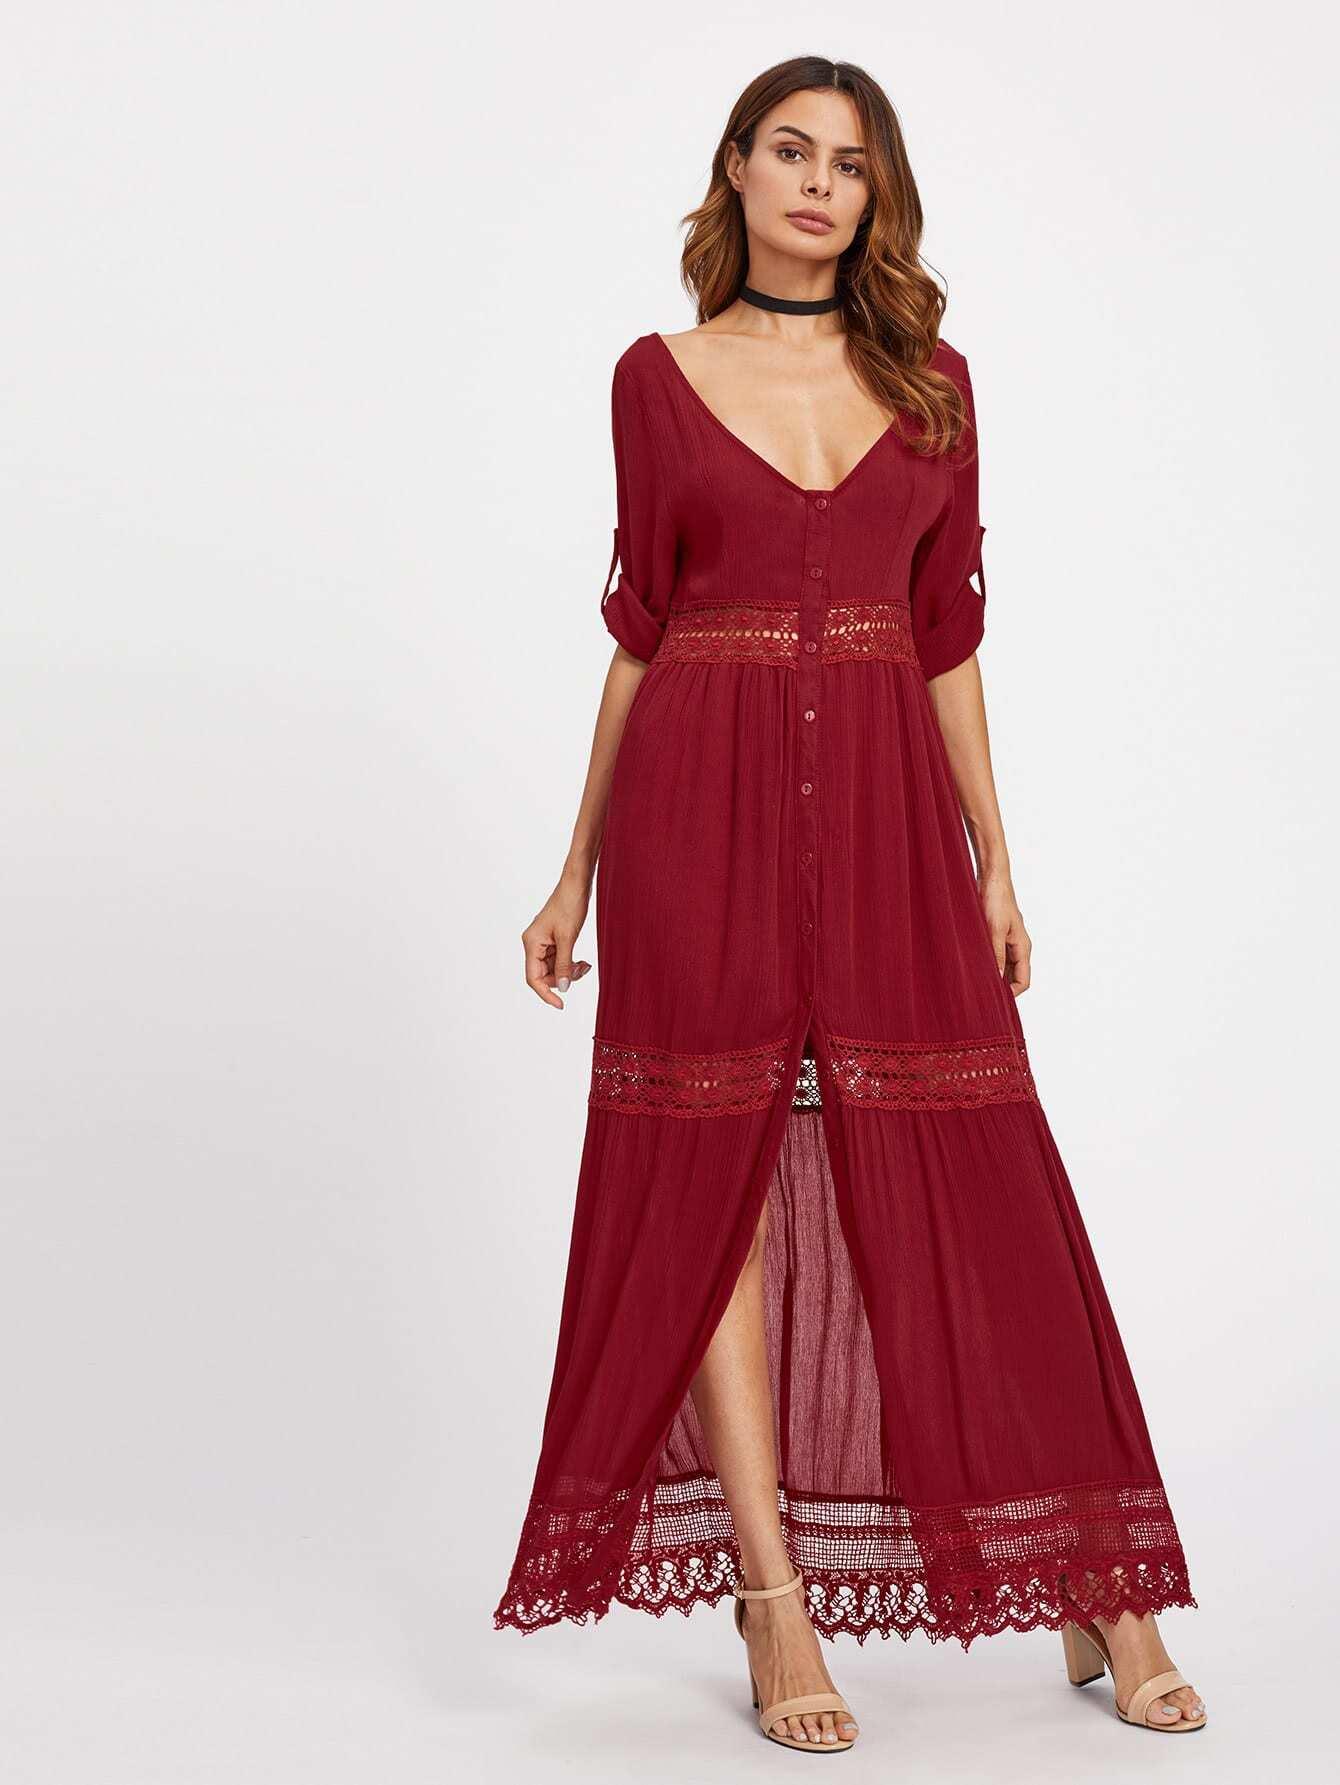 Фото Double Plunge Neckline Split Front Lace Insert Dress. Купить с доставкой